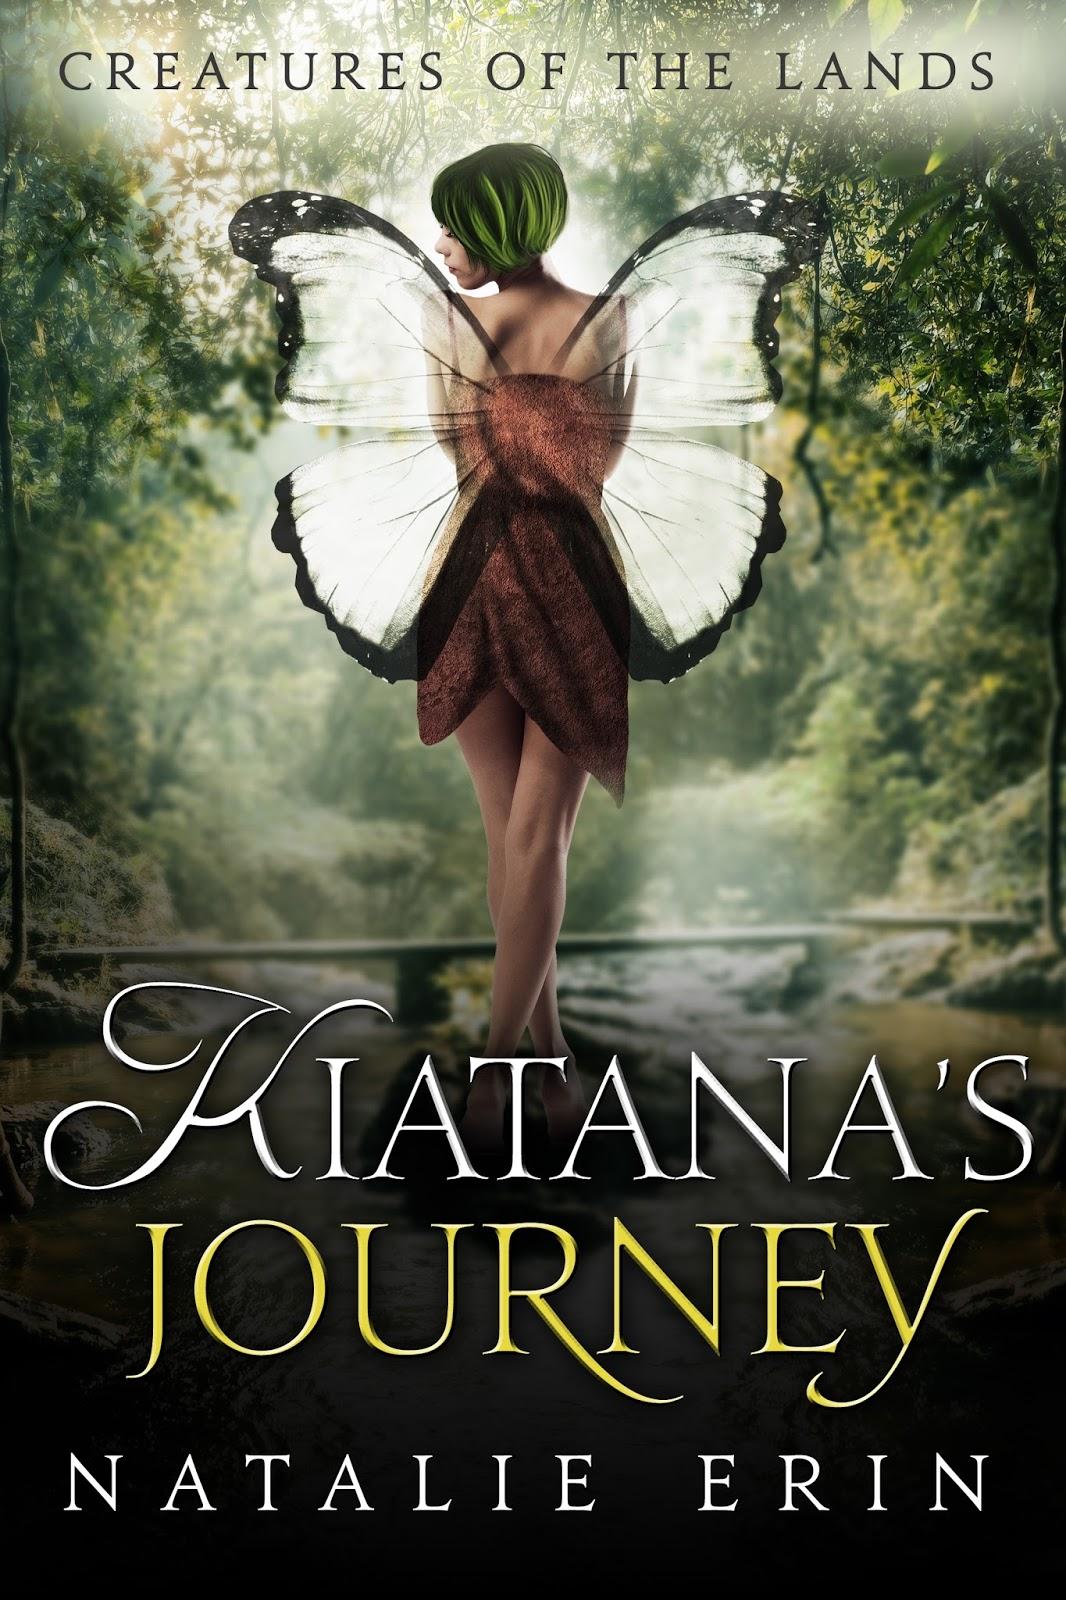 Book Spotlight: Kiatana's Journey by Natalie Erin